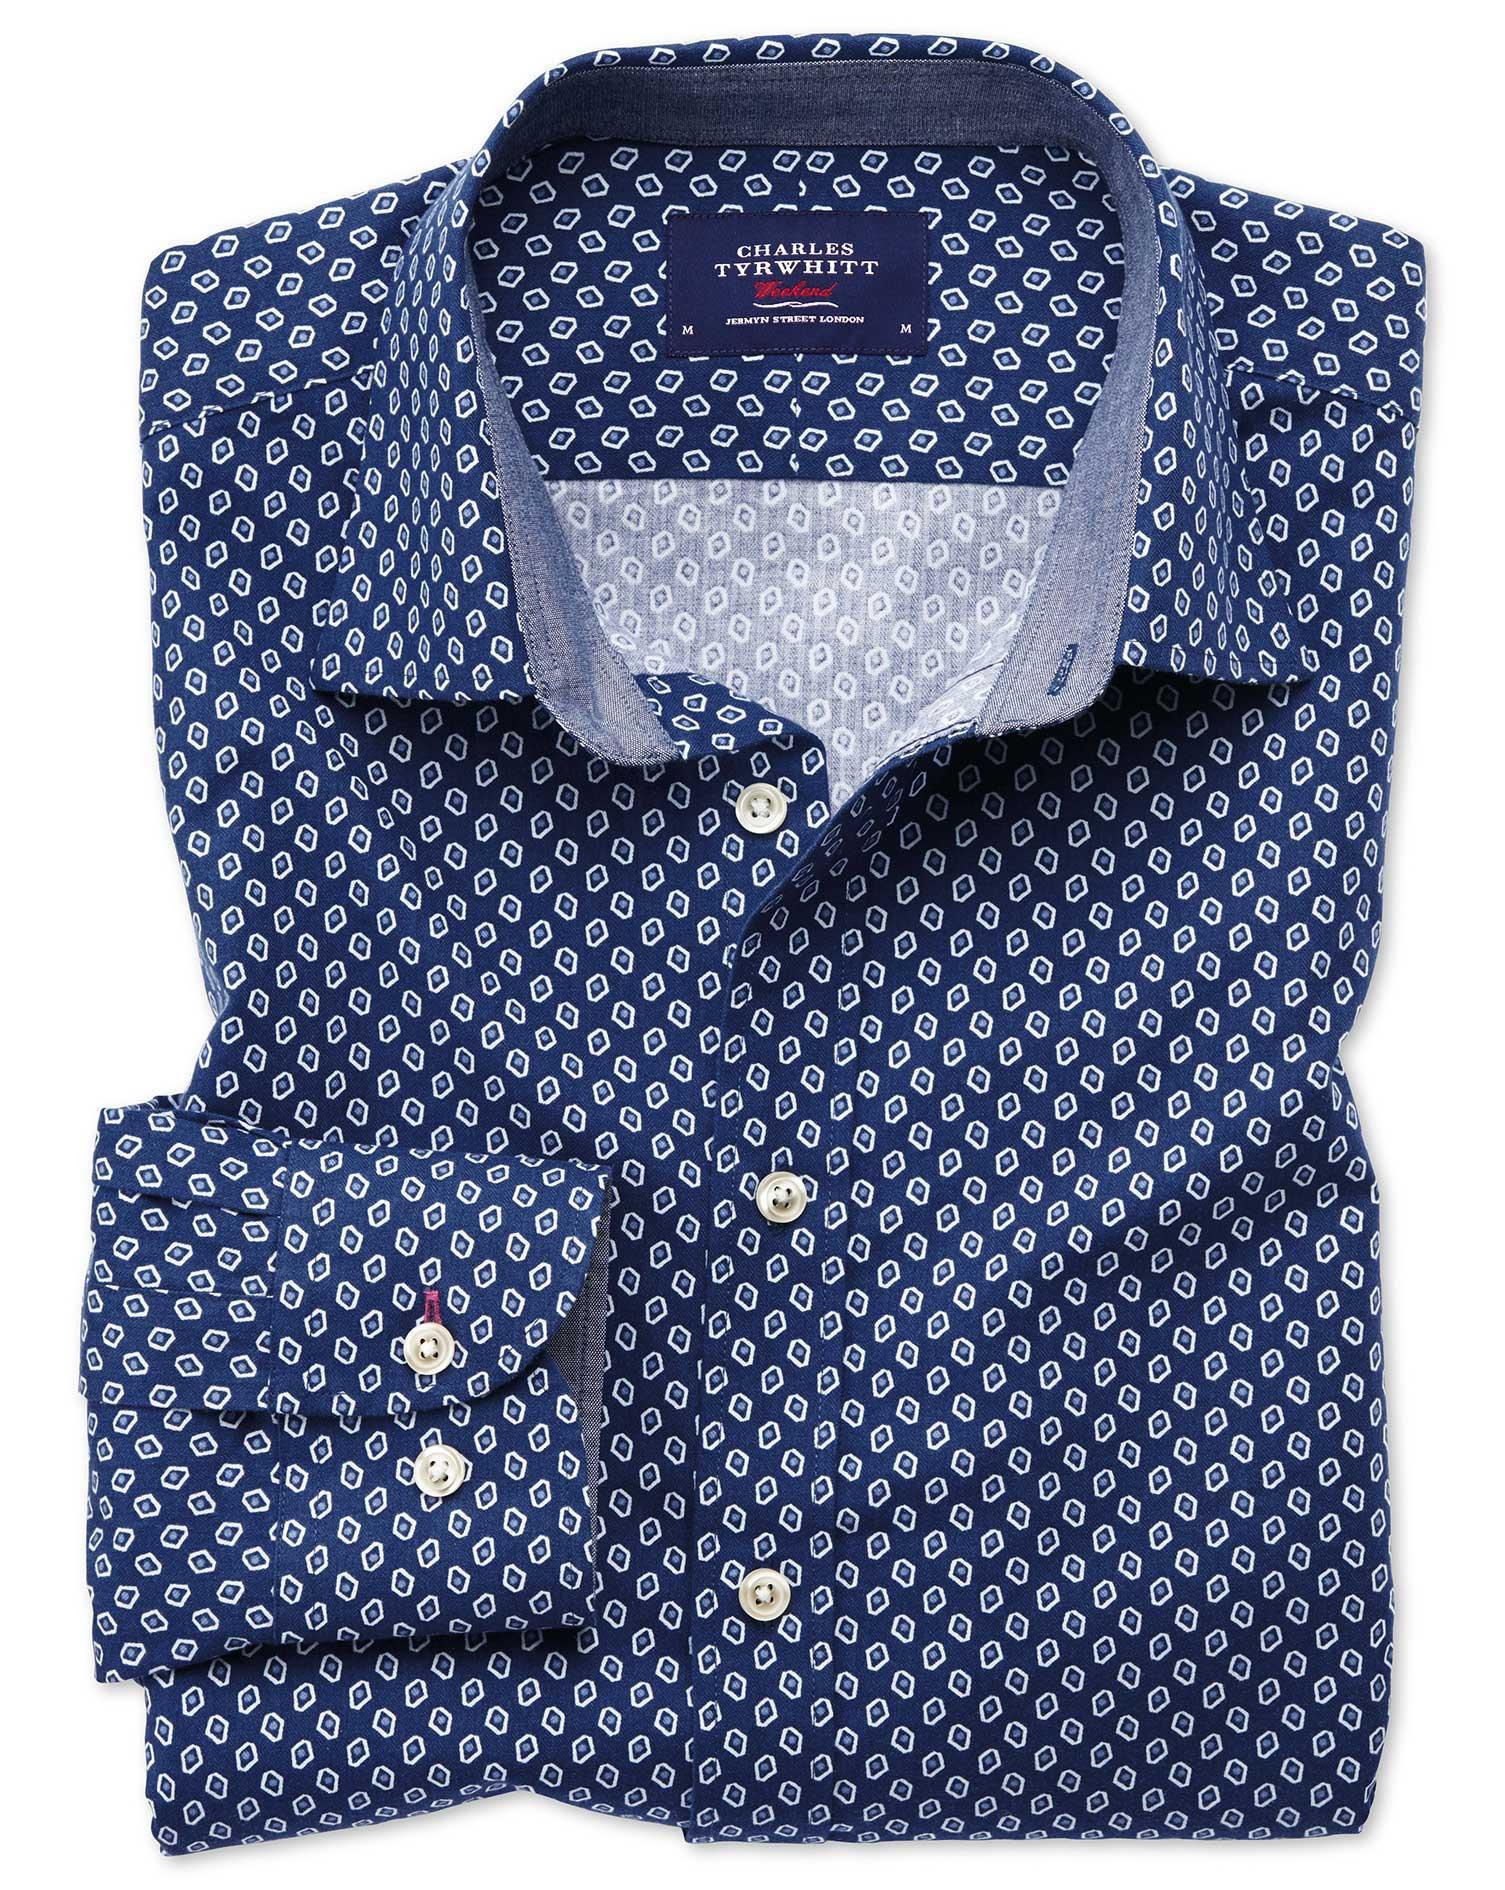 Classic Fit Blue and White Geometric Print Cotton Shirt Single Cuff Size Medium by Charles Tyrwhitt